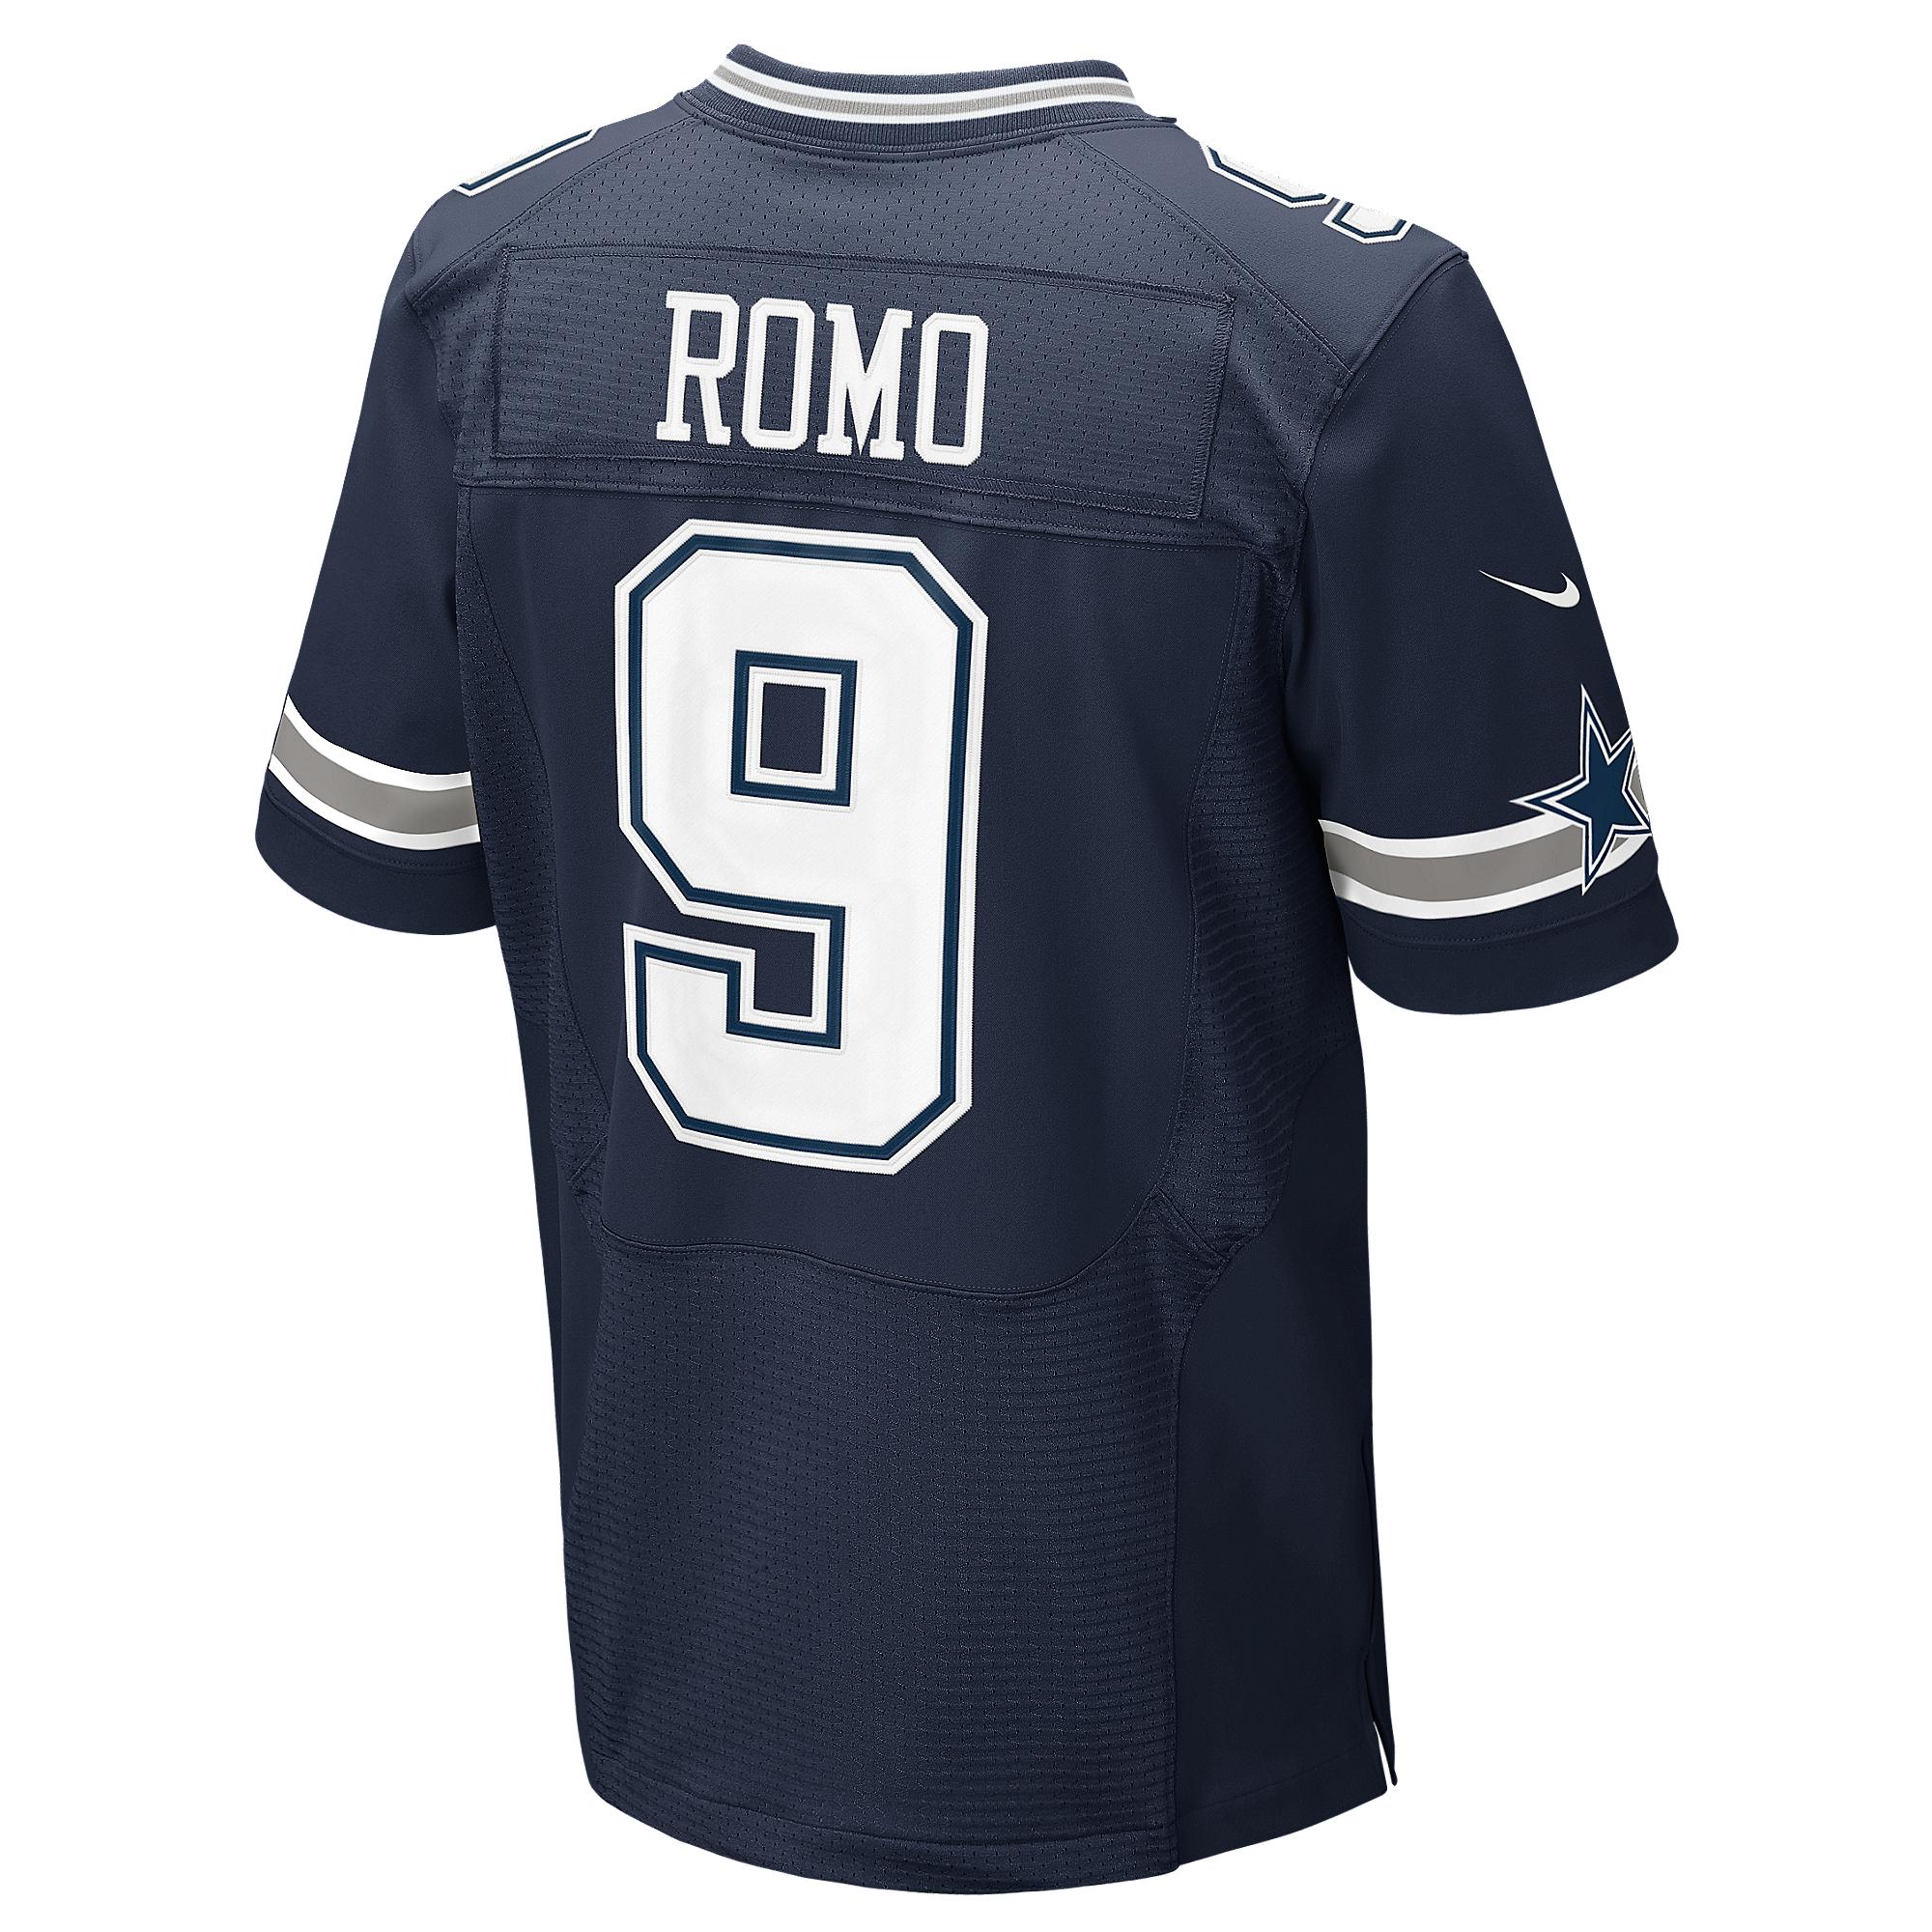 df9e0119dc1 Dallas Cowboys Tony Romo #9 Nike Elite Authentic Jersey | Dallas Cowboys  Pro Shop